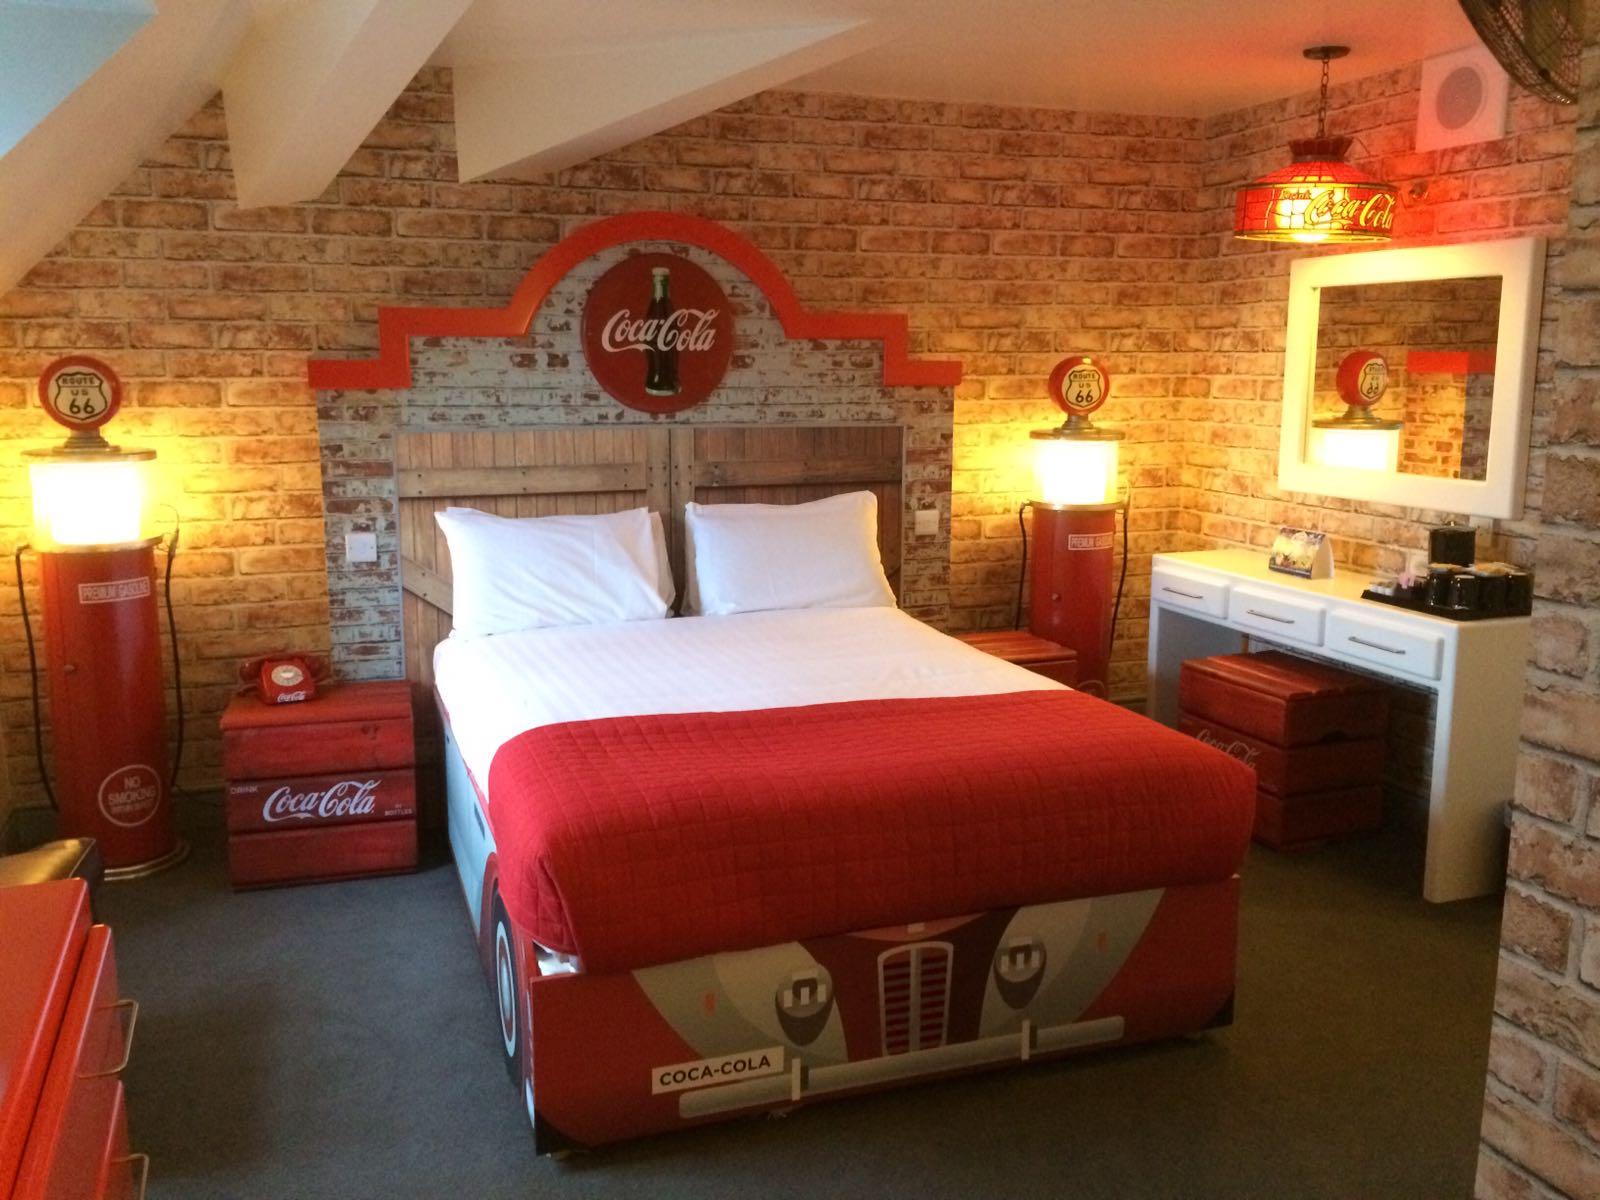 Positive Coca Cola Alton Towers Hotel